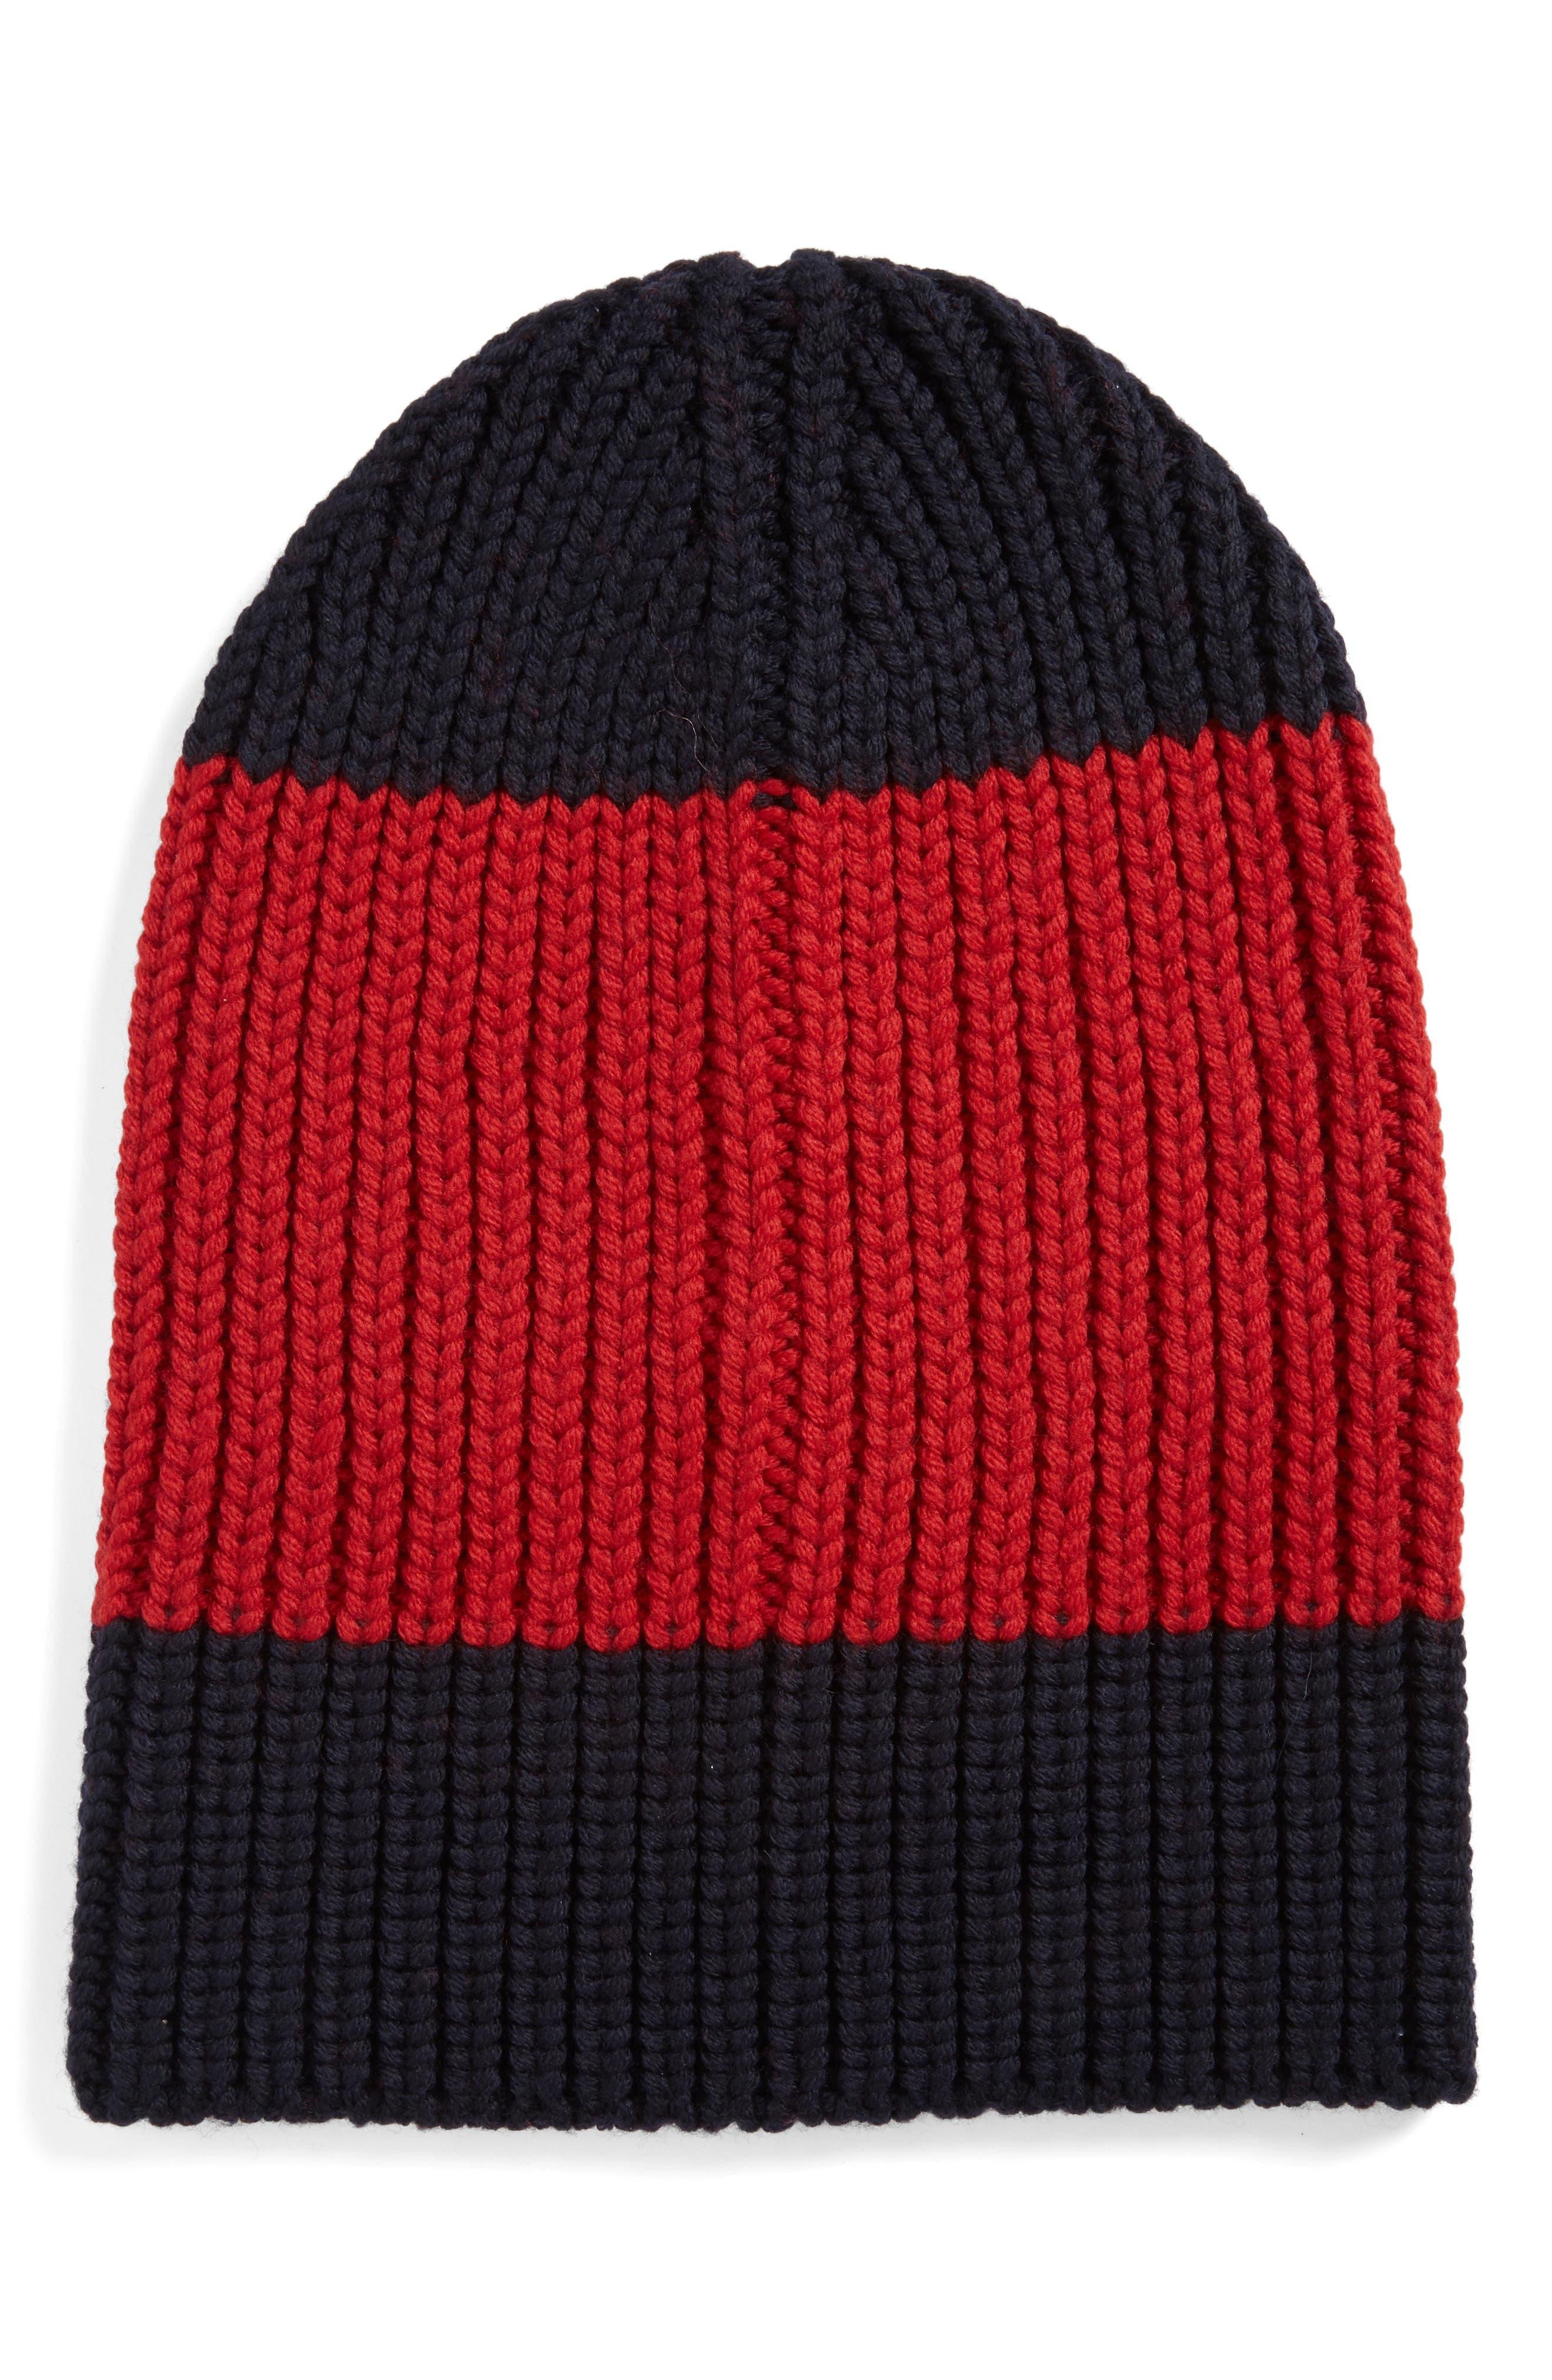 Gucci Colorblock Wool Knit Cap